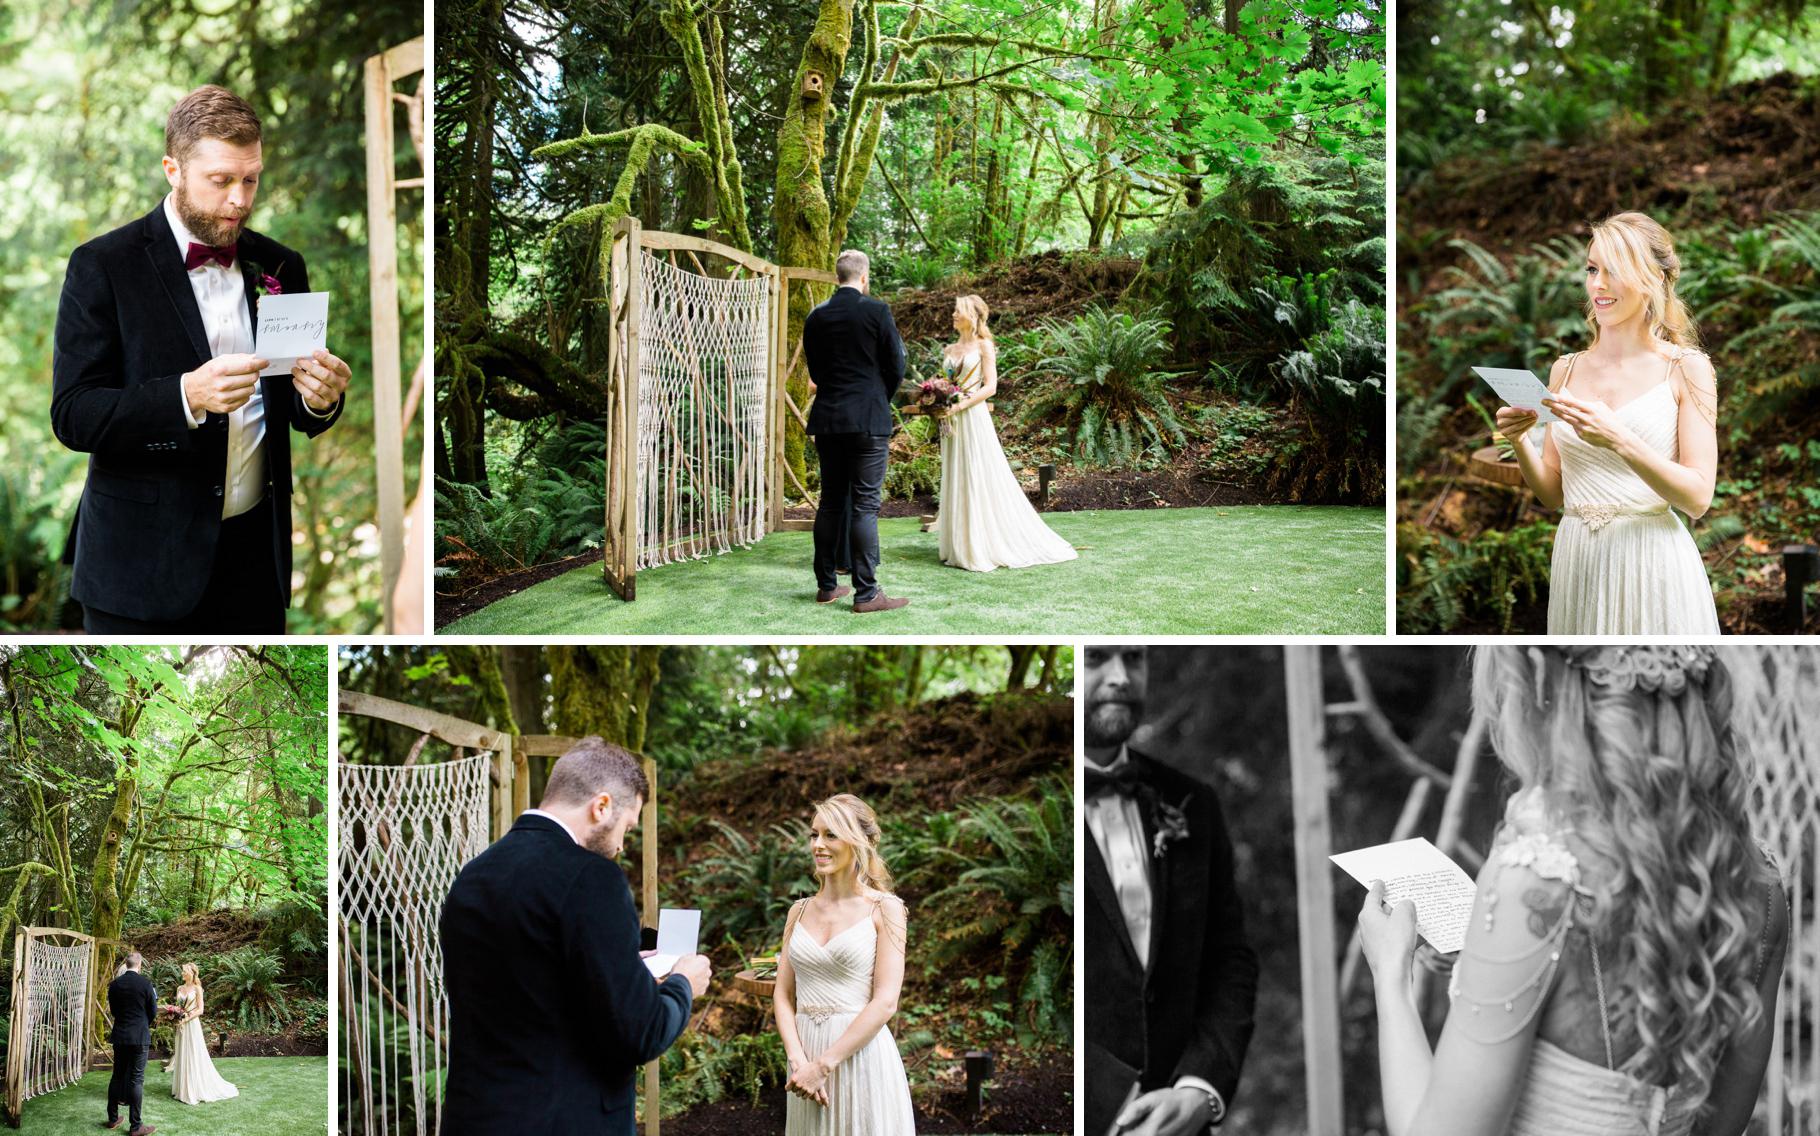 12-Treehouse-Point-Elopement-Seattle-Wedding-Photographer-Ceremony